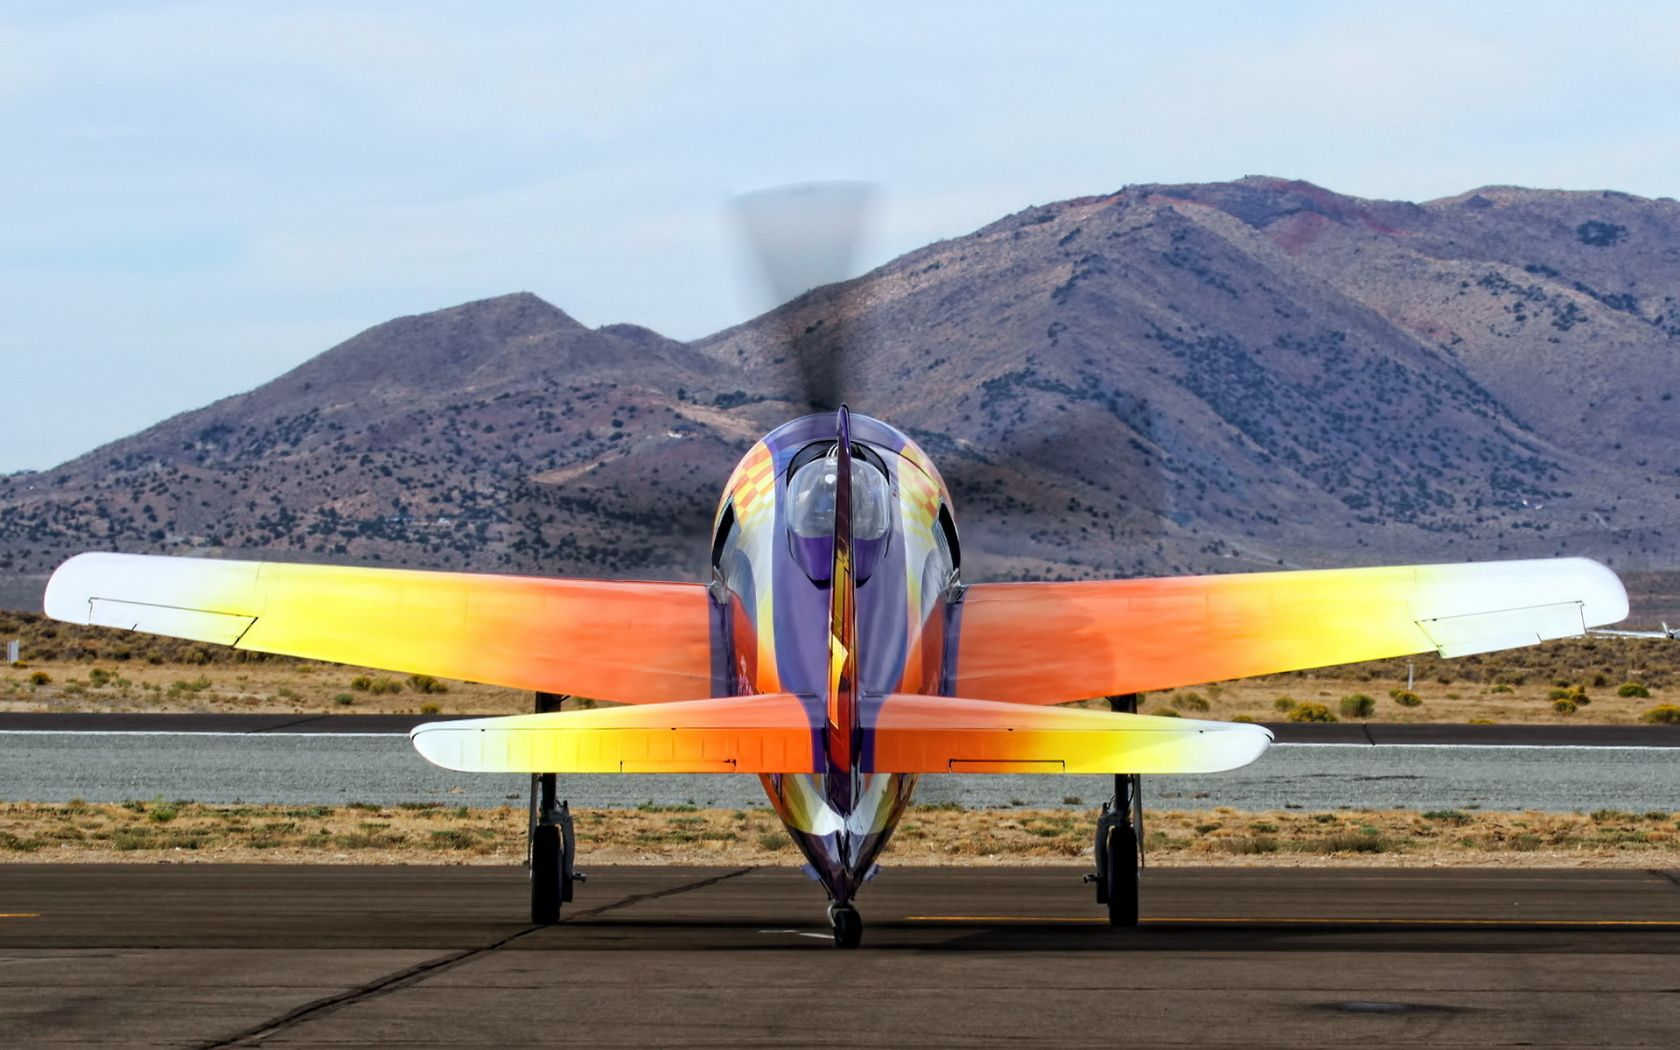 The Plane Picture